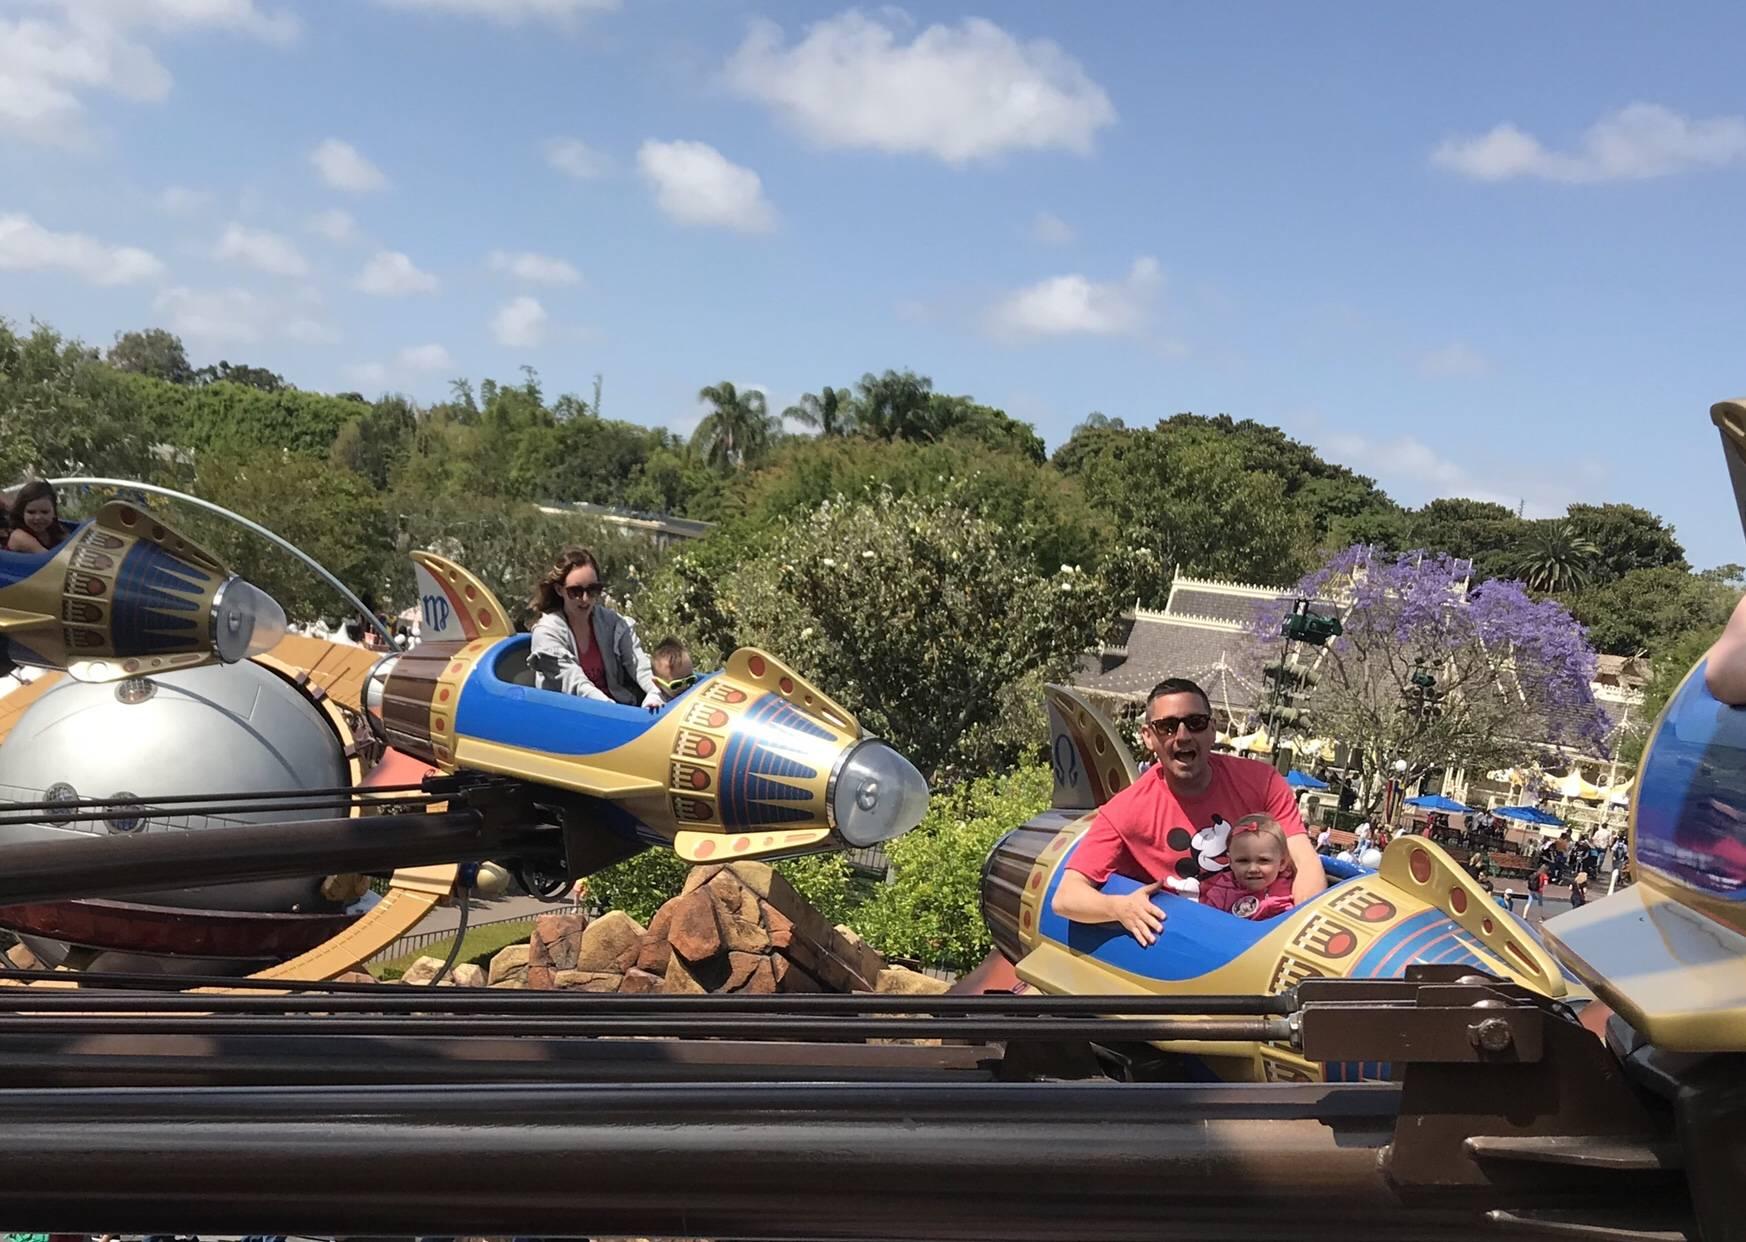 Rides at Disneyland